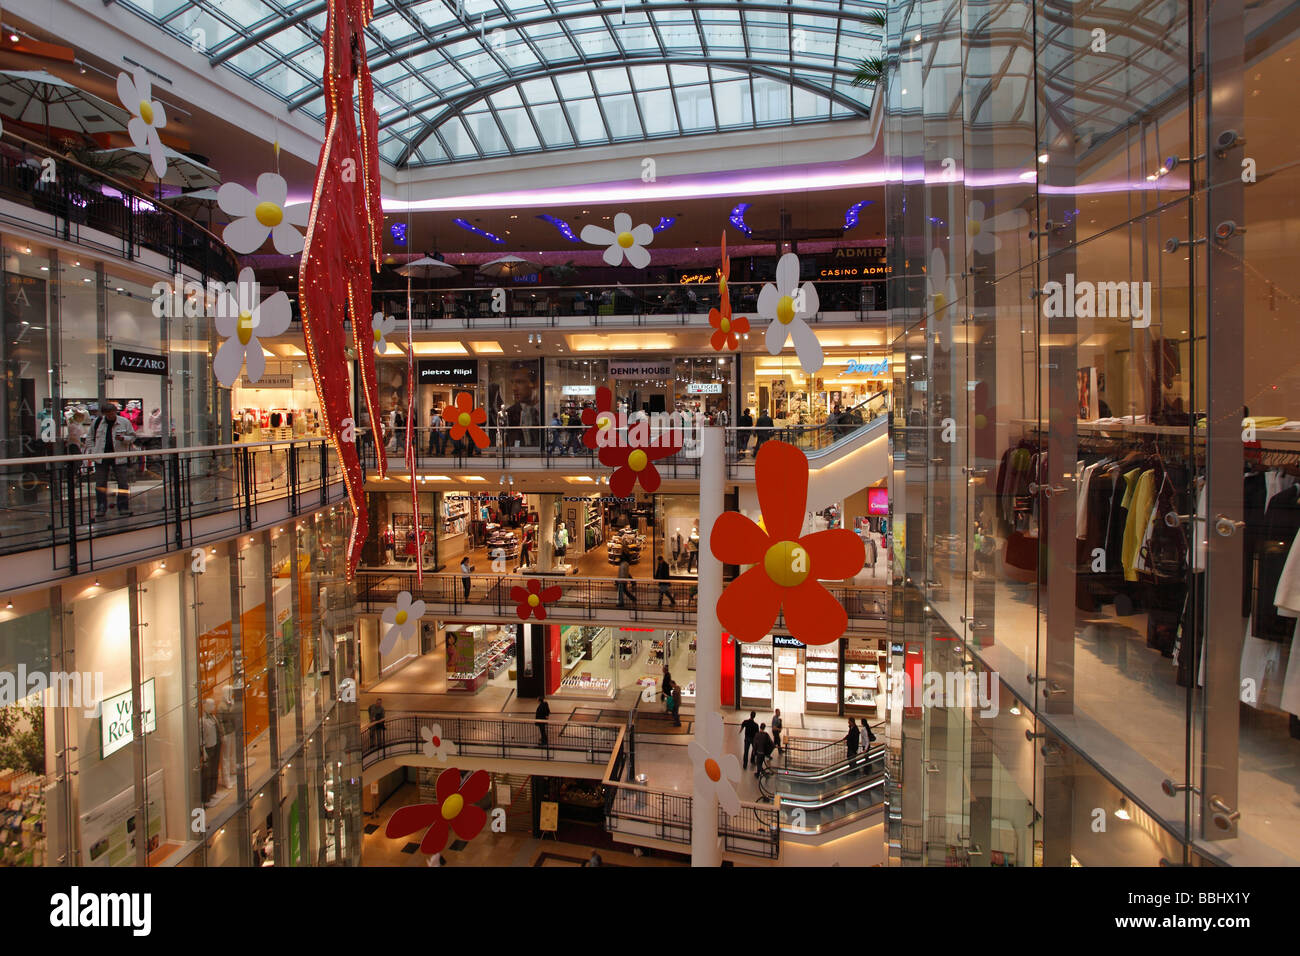 Czech Republic Prague Palladium Shopping Centre - Stock Image